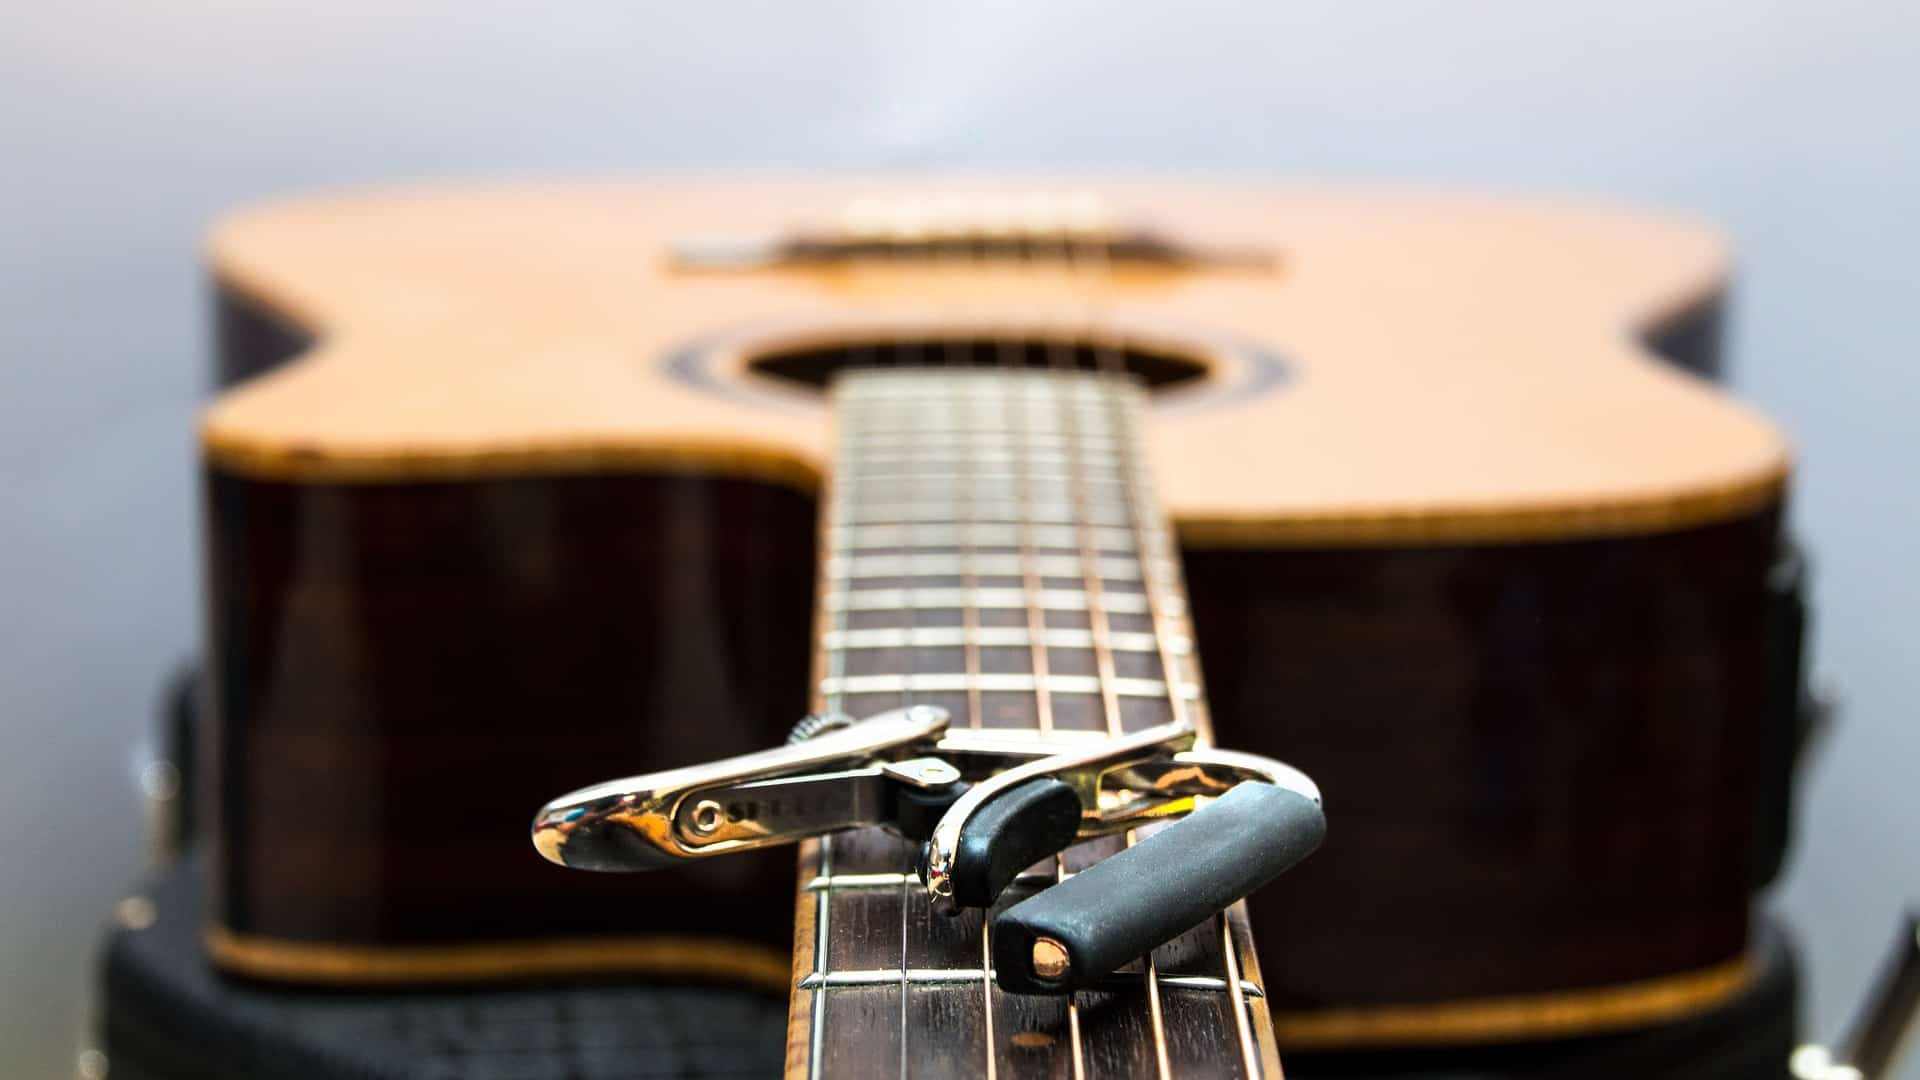 Westerngitarre E-Gitarre Guitar Kapodaster Capodaster für Akustikgitarre